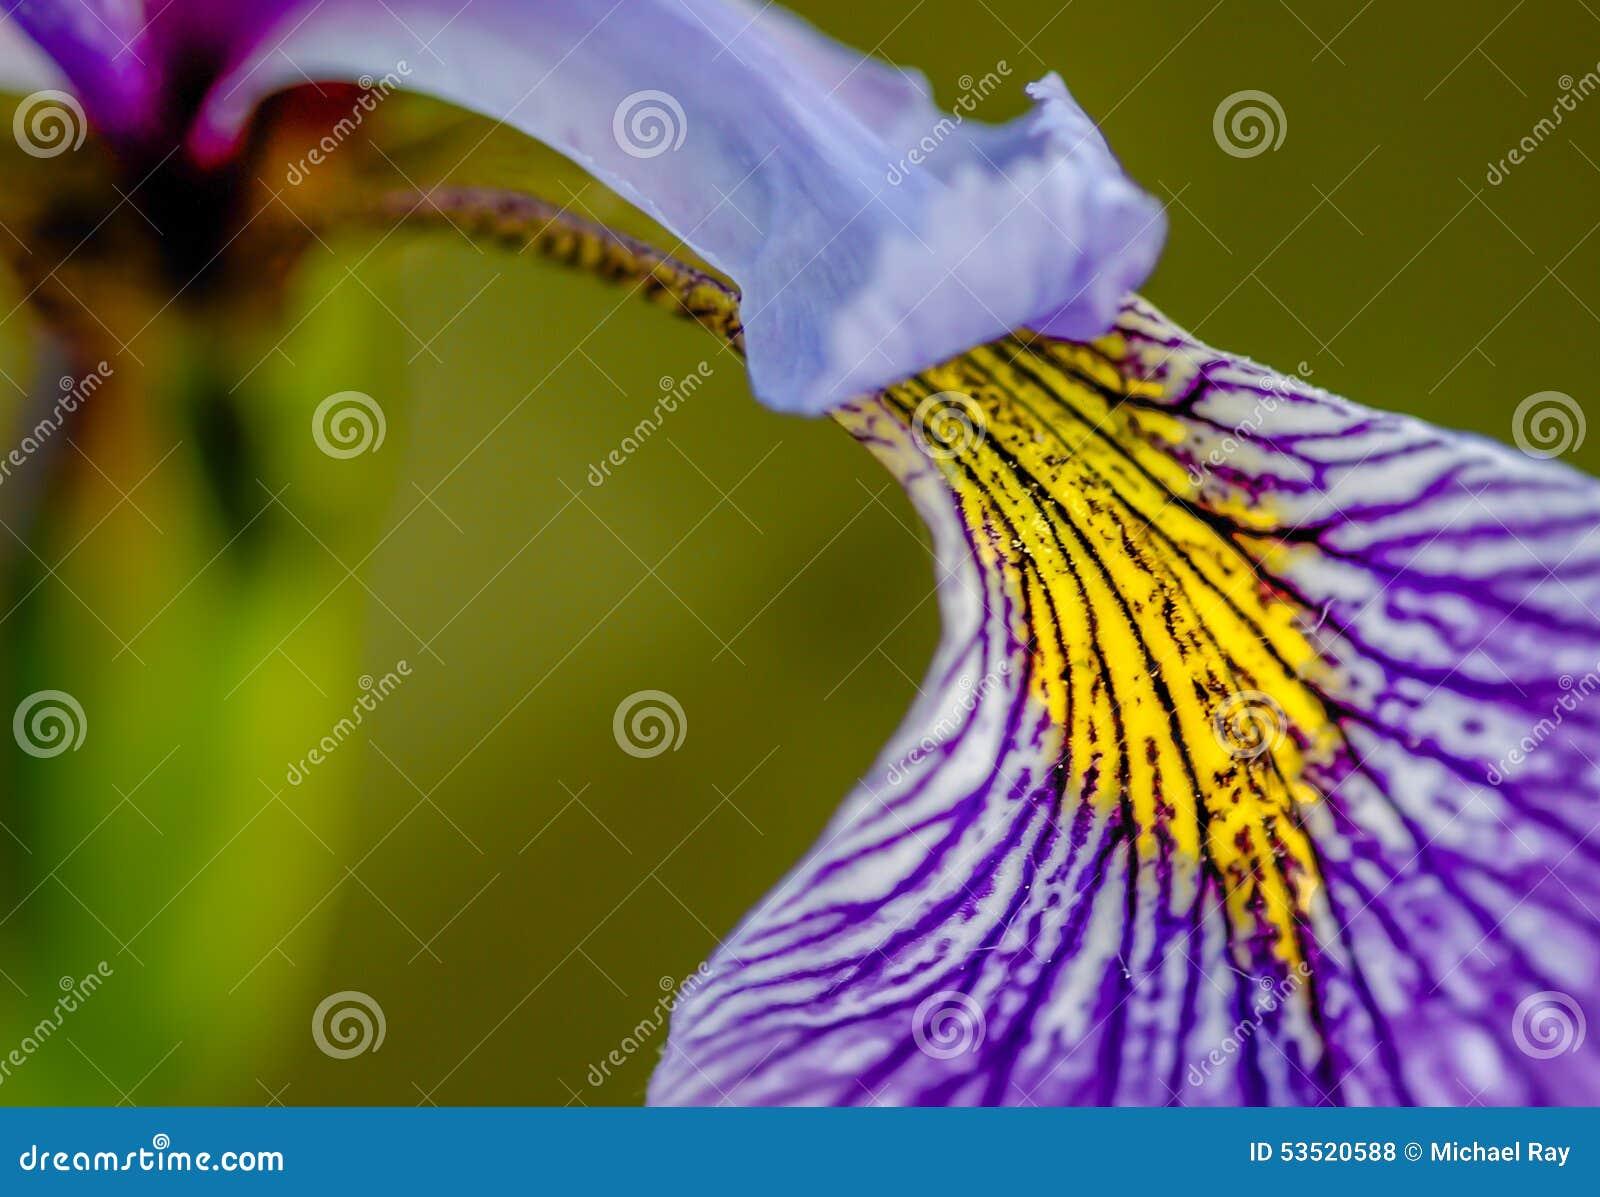 iris the greek goddess of the rainbow stock photo image 53520588